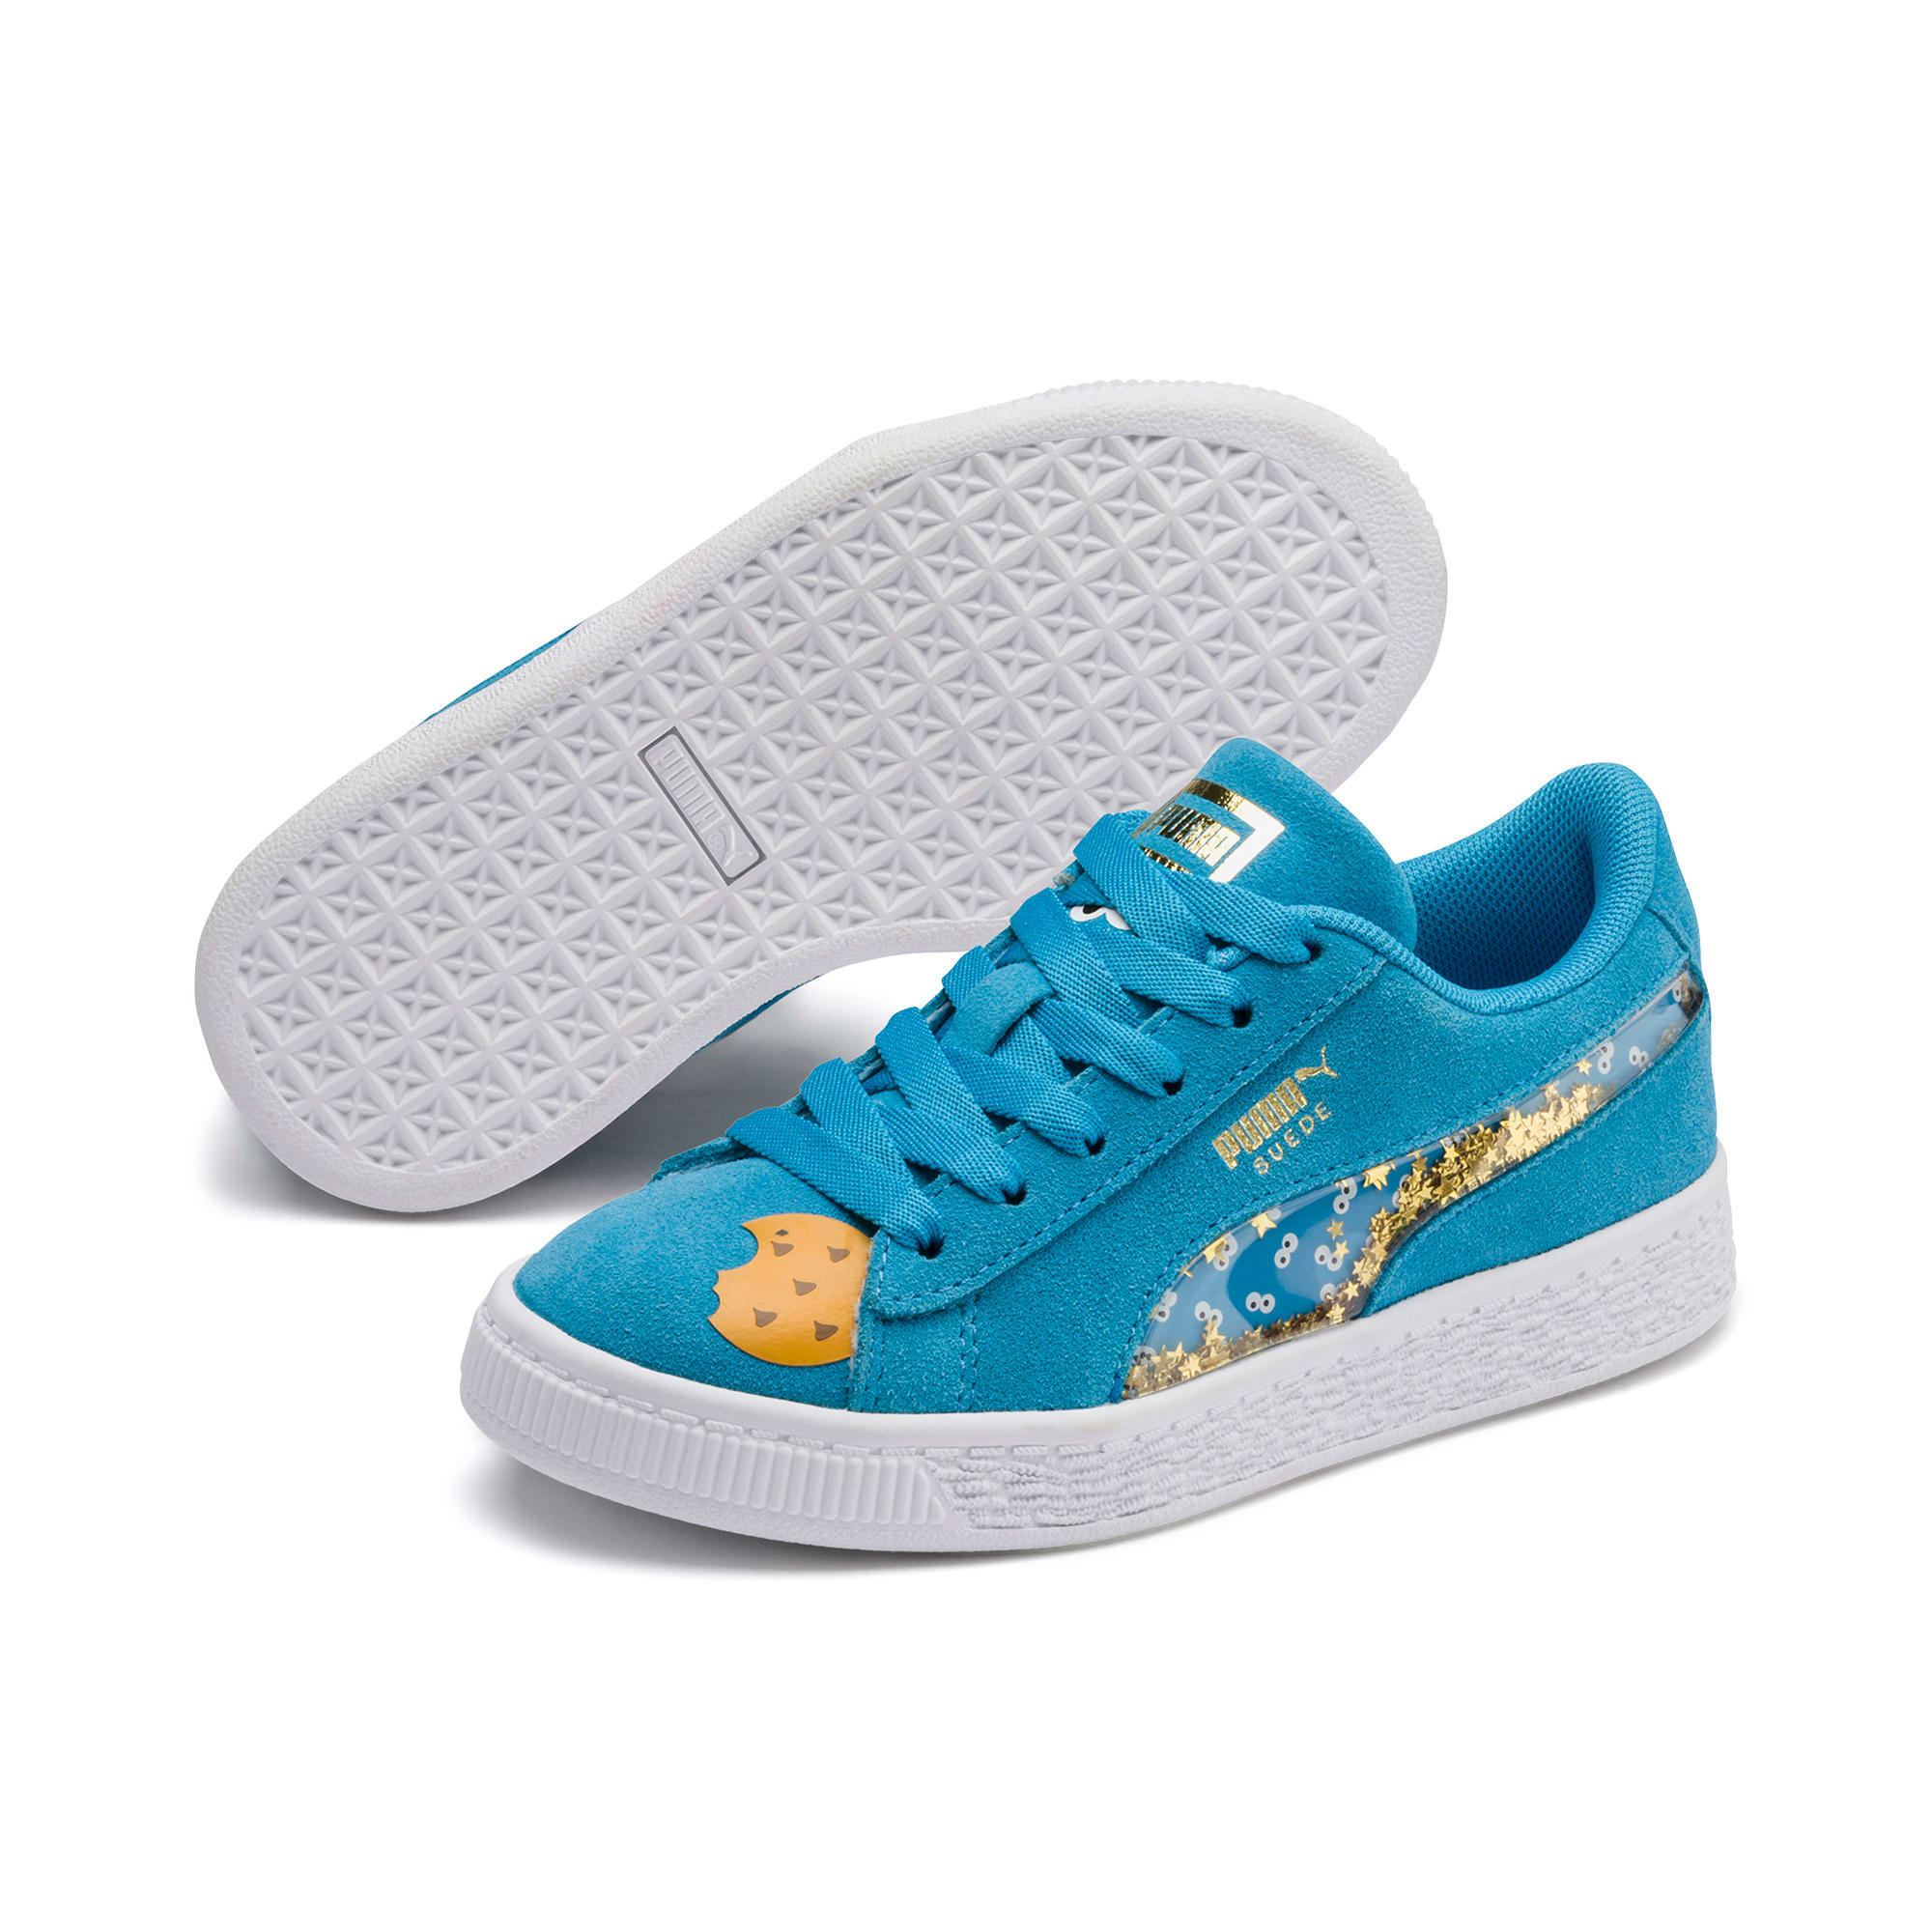 Thumbnail 2 of Sesamstraße 50 Suede Statement Kids Sneaker, Bleu Azur-Puma White, medium